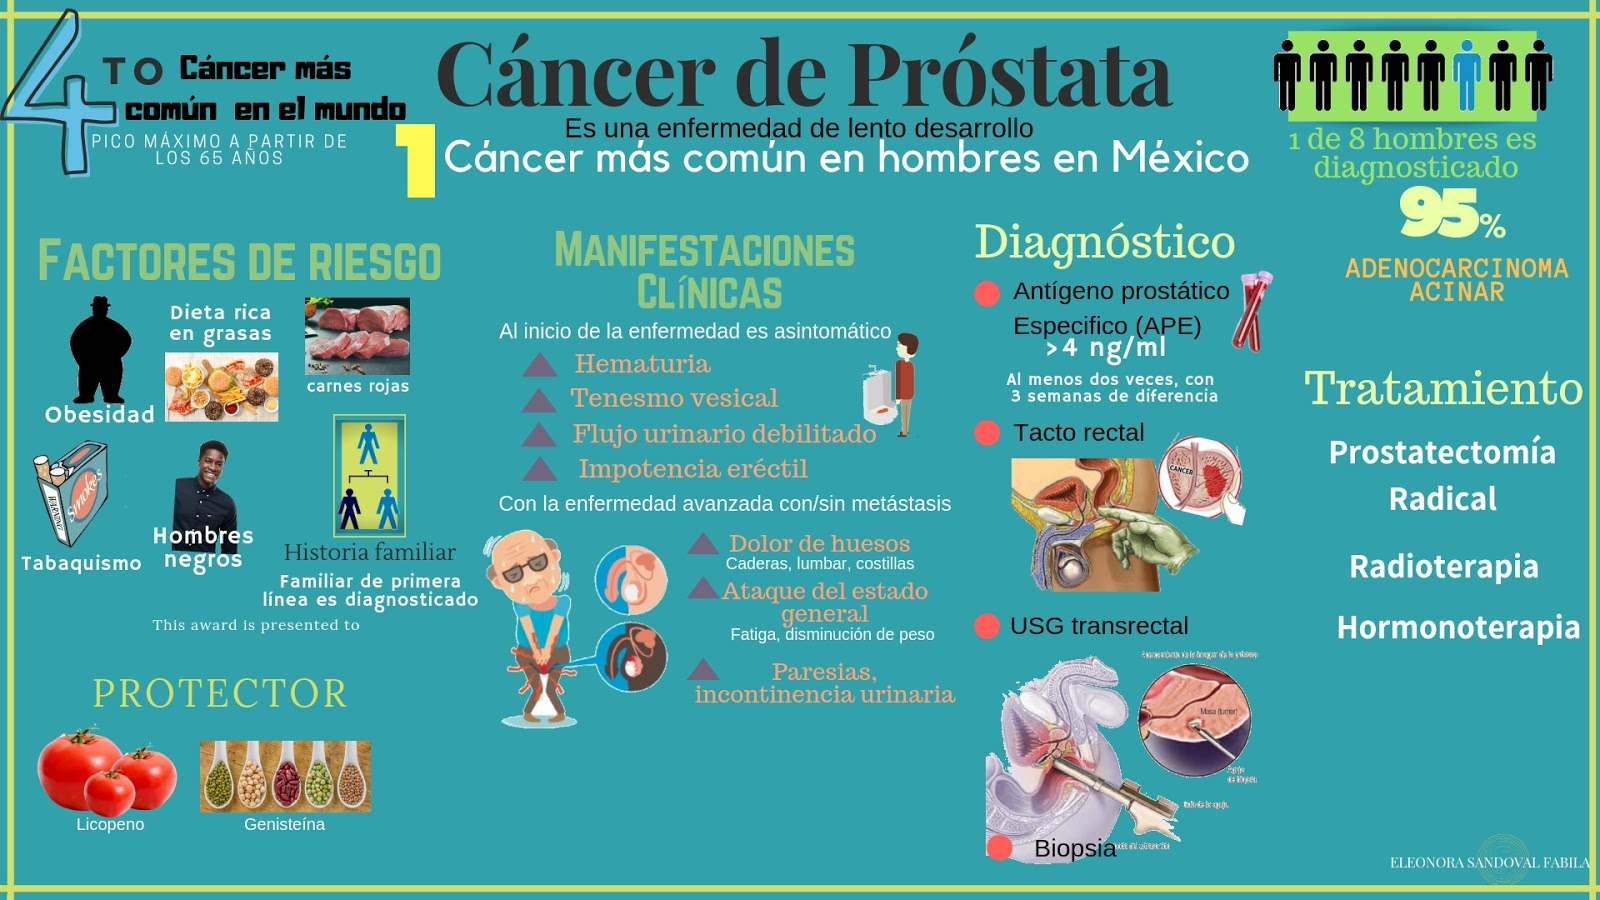 neoplasmas malignos de cáncer de próstata